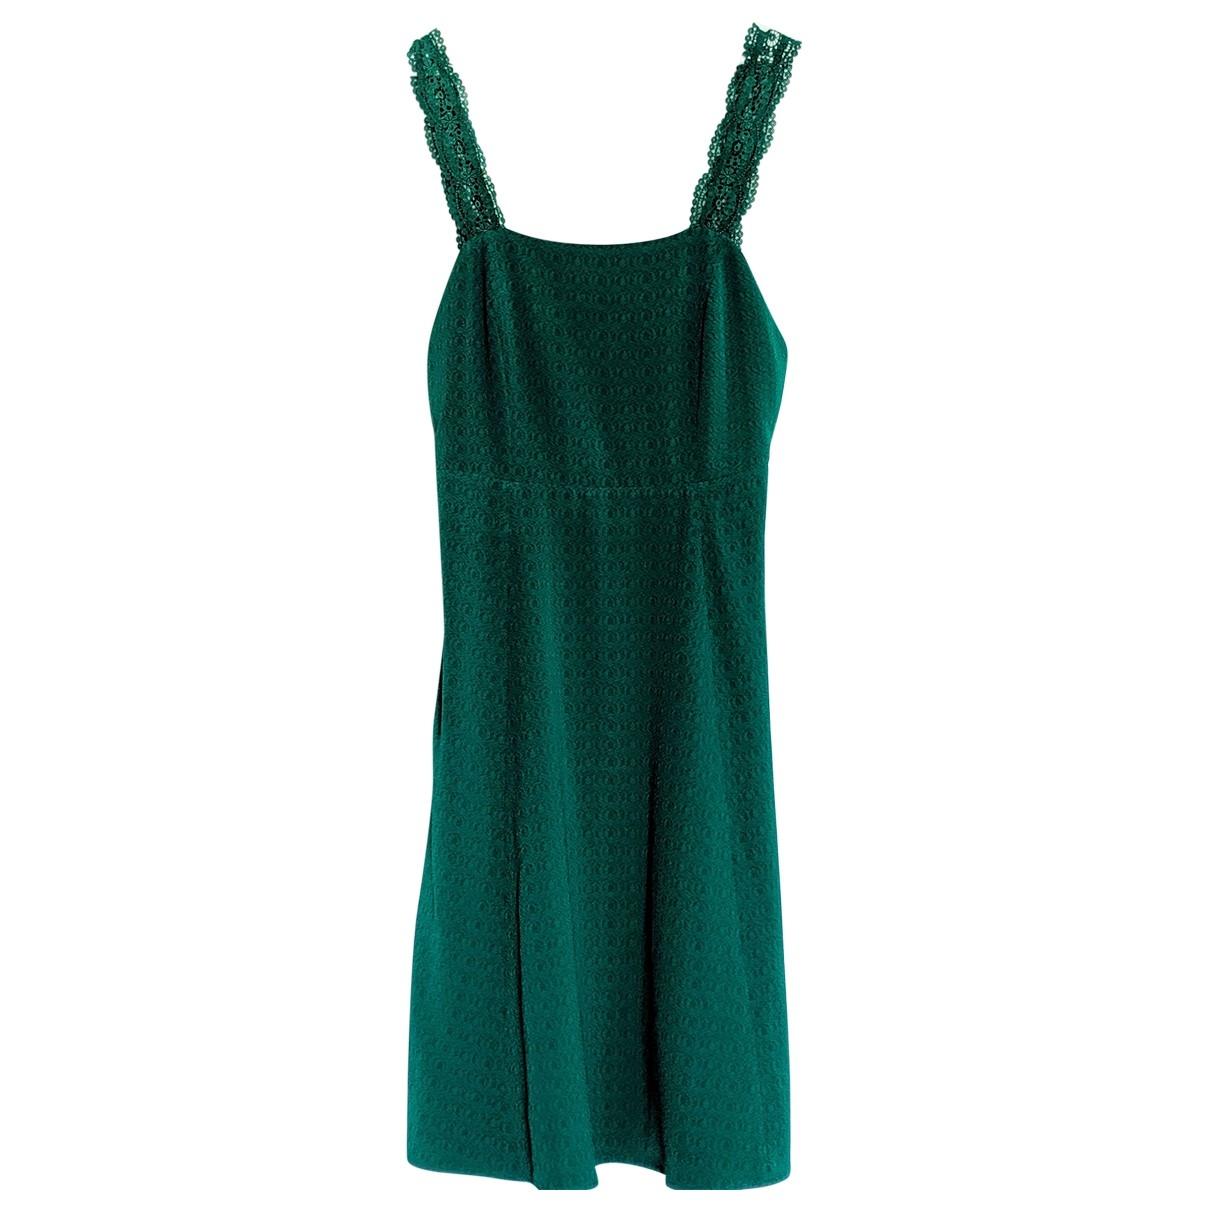 Sézane \N Green dress for Women 42 FR